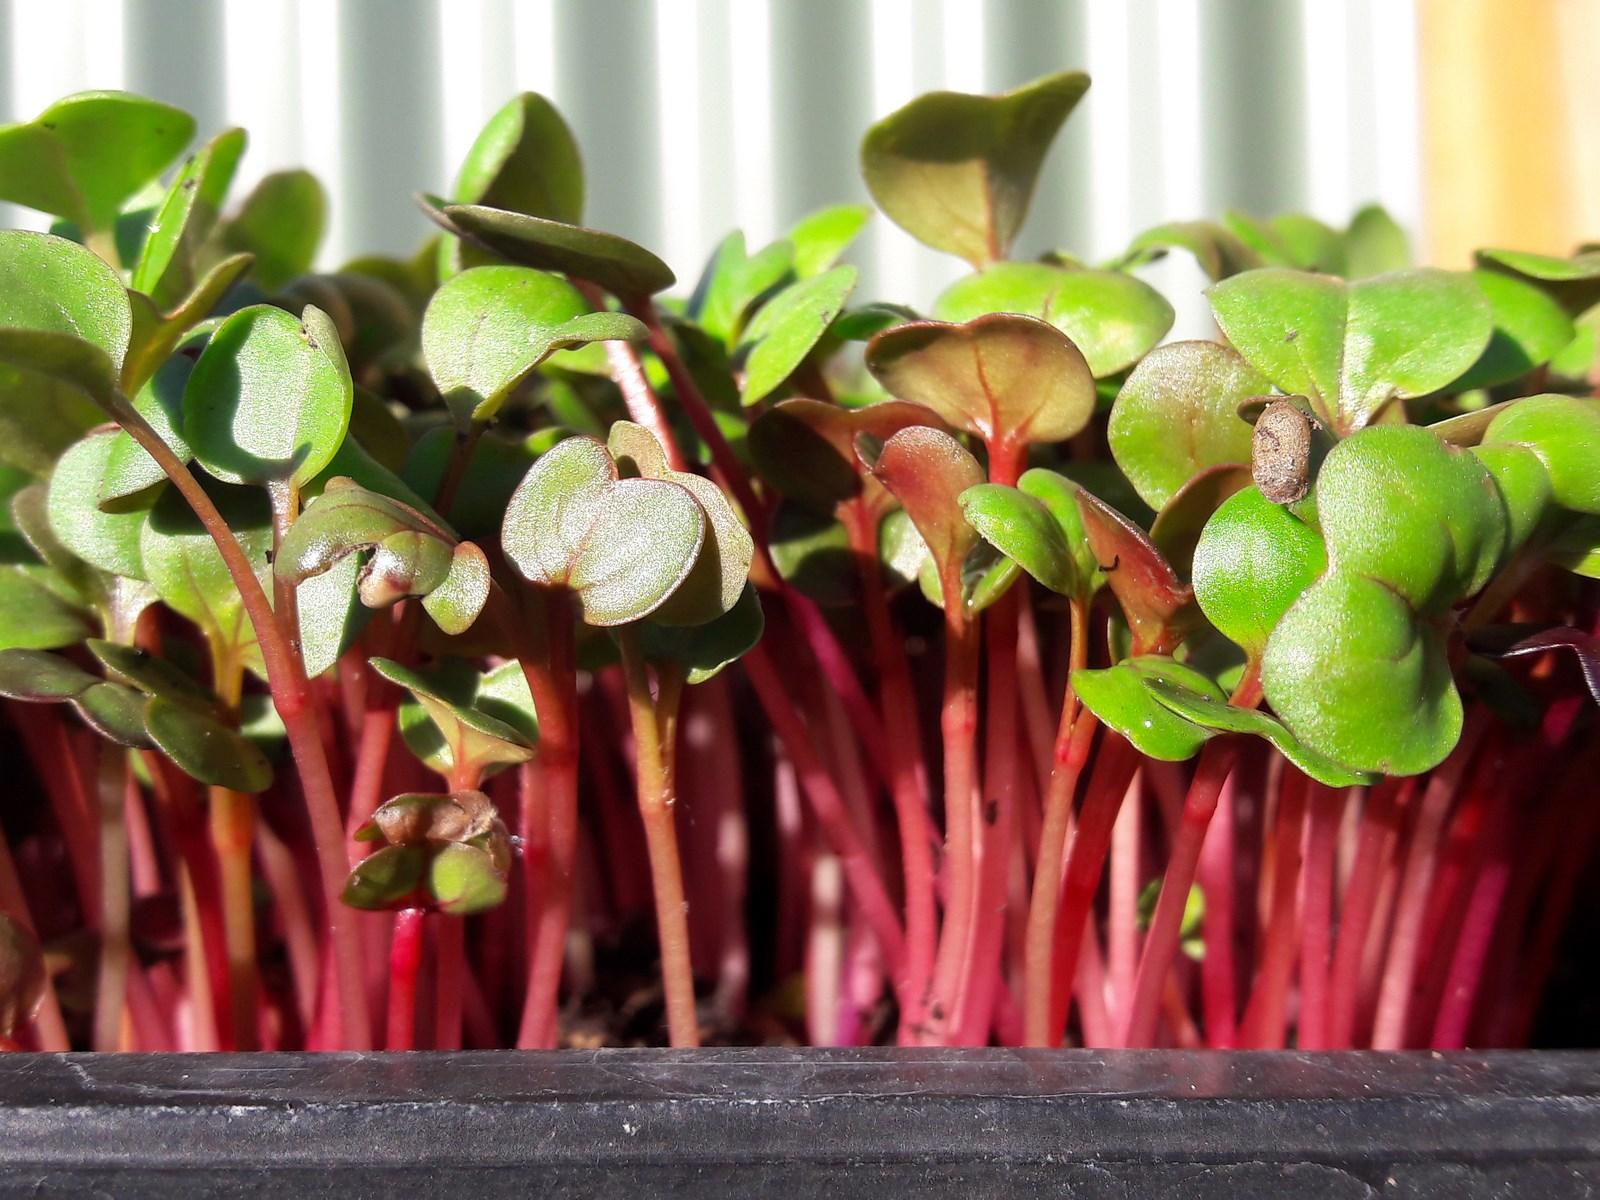 kahikatea-farm-microgreens radish rose